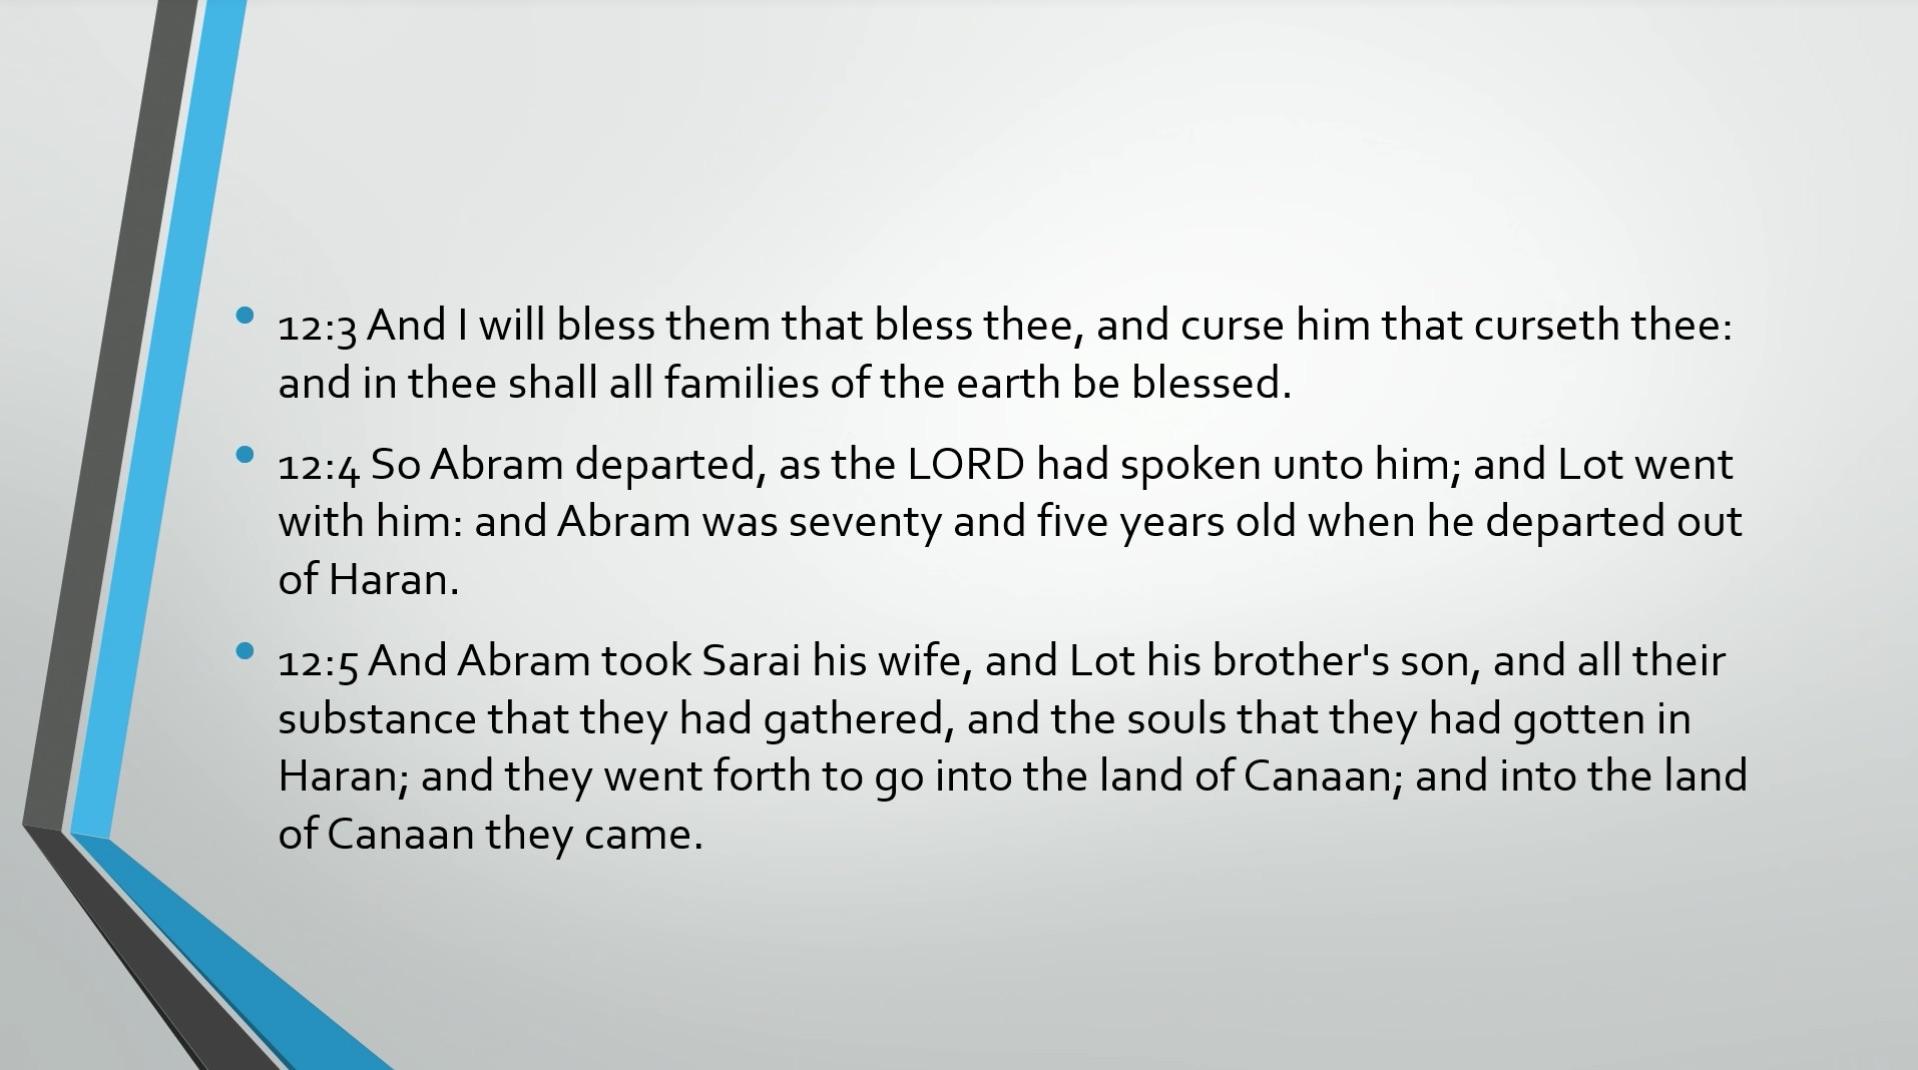 Biblical Series IX: The Call to Abraham Transcript | Jordan Peterson